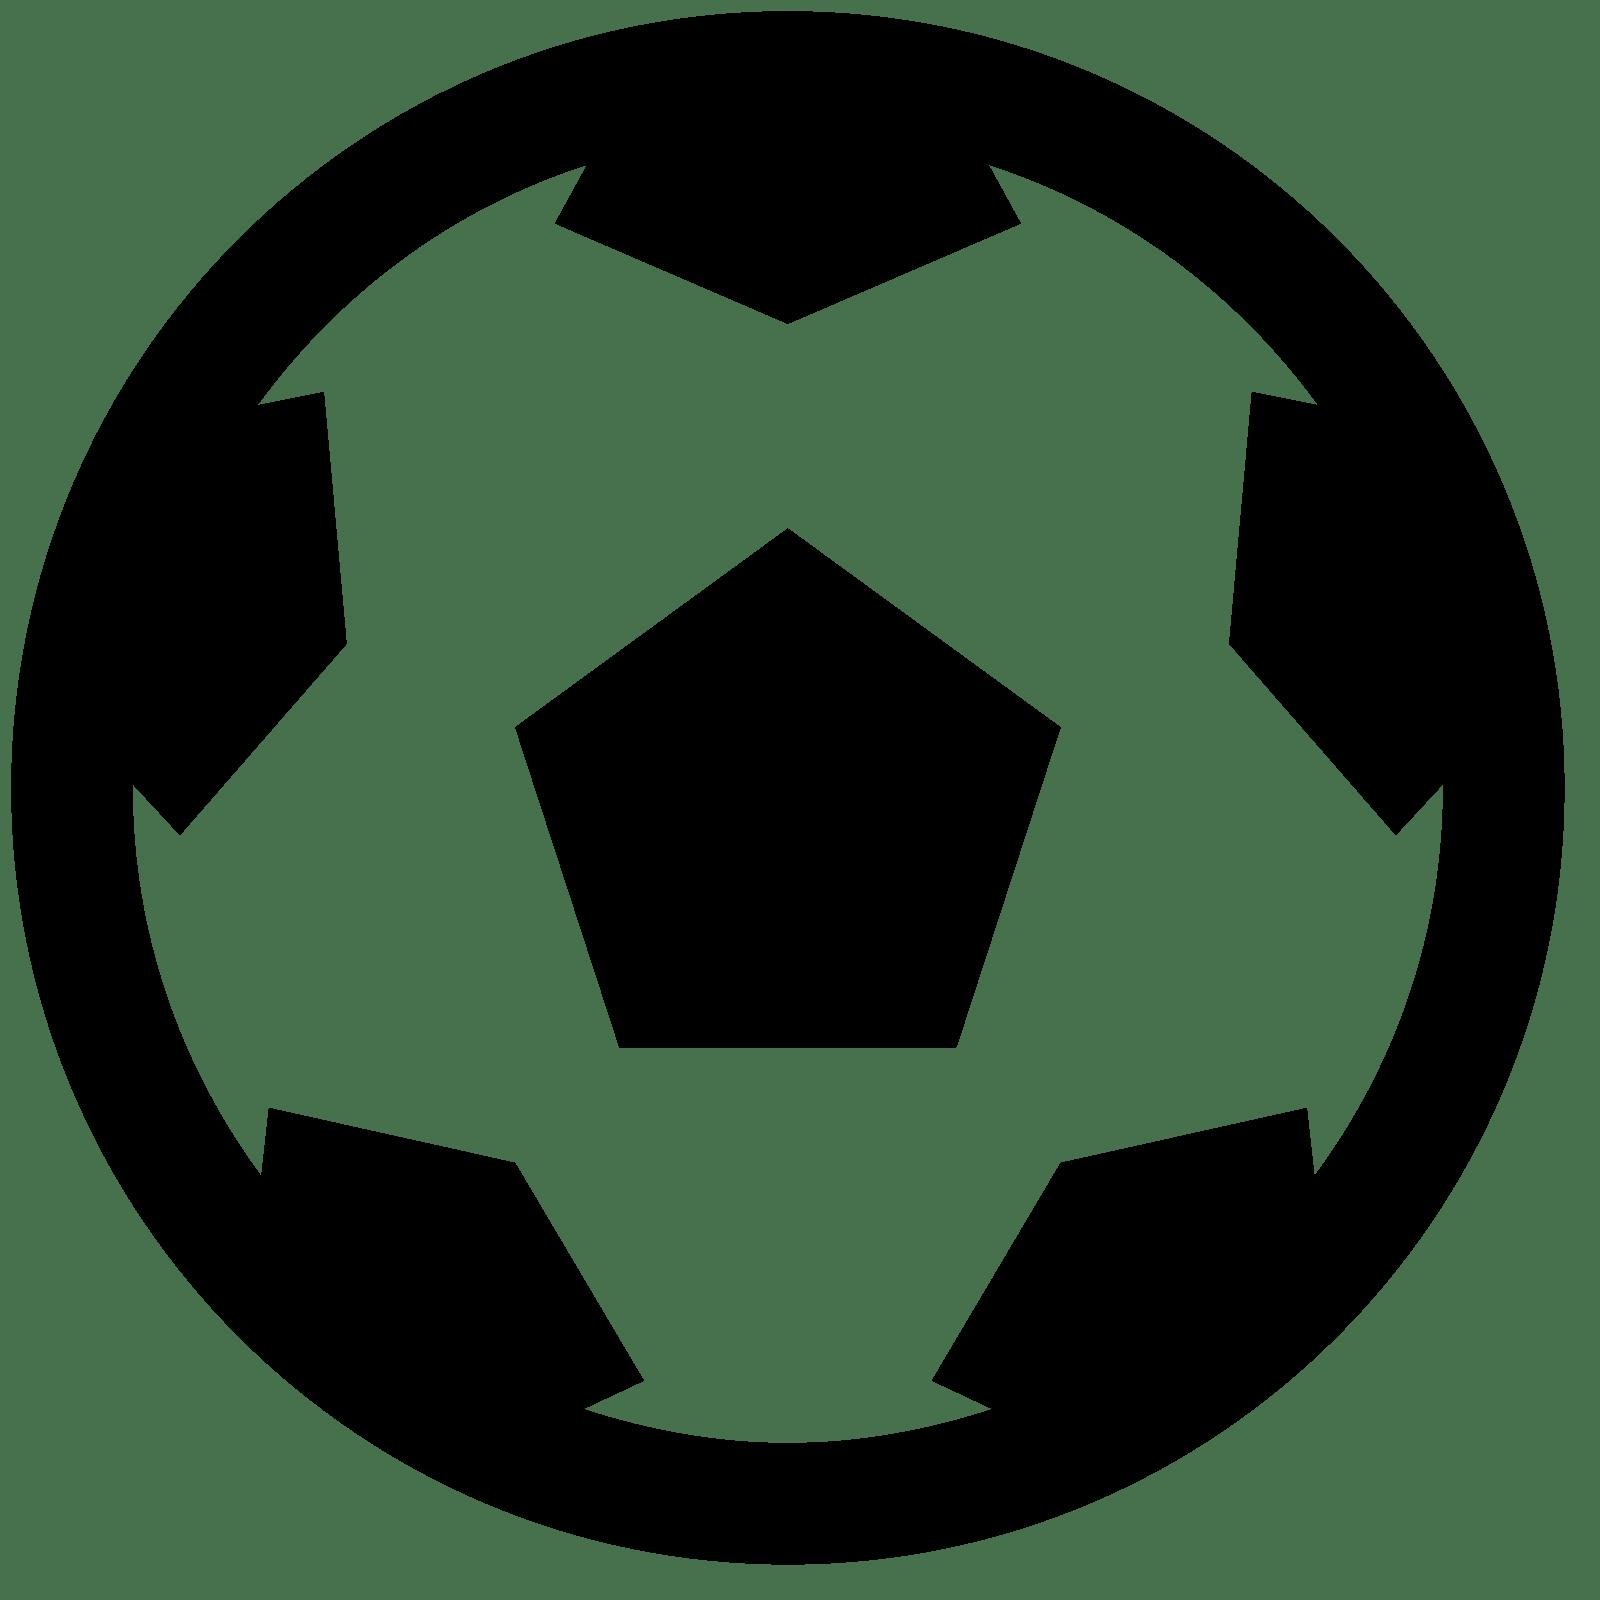 Football Ball Png